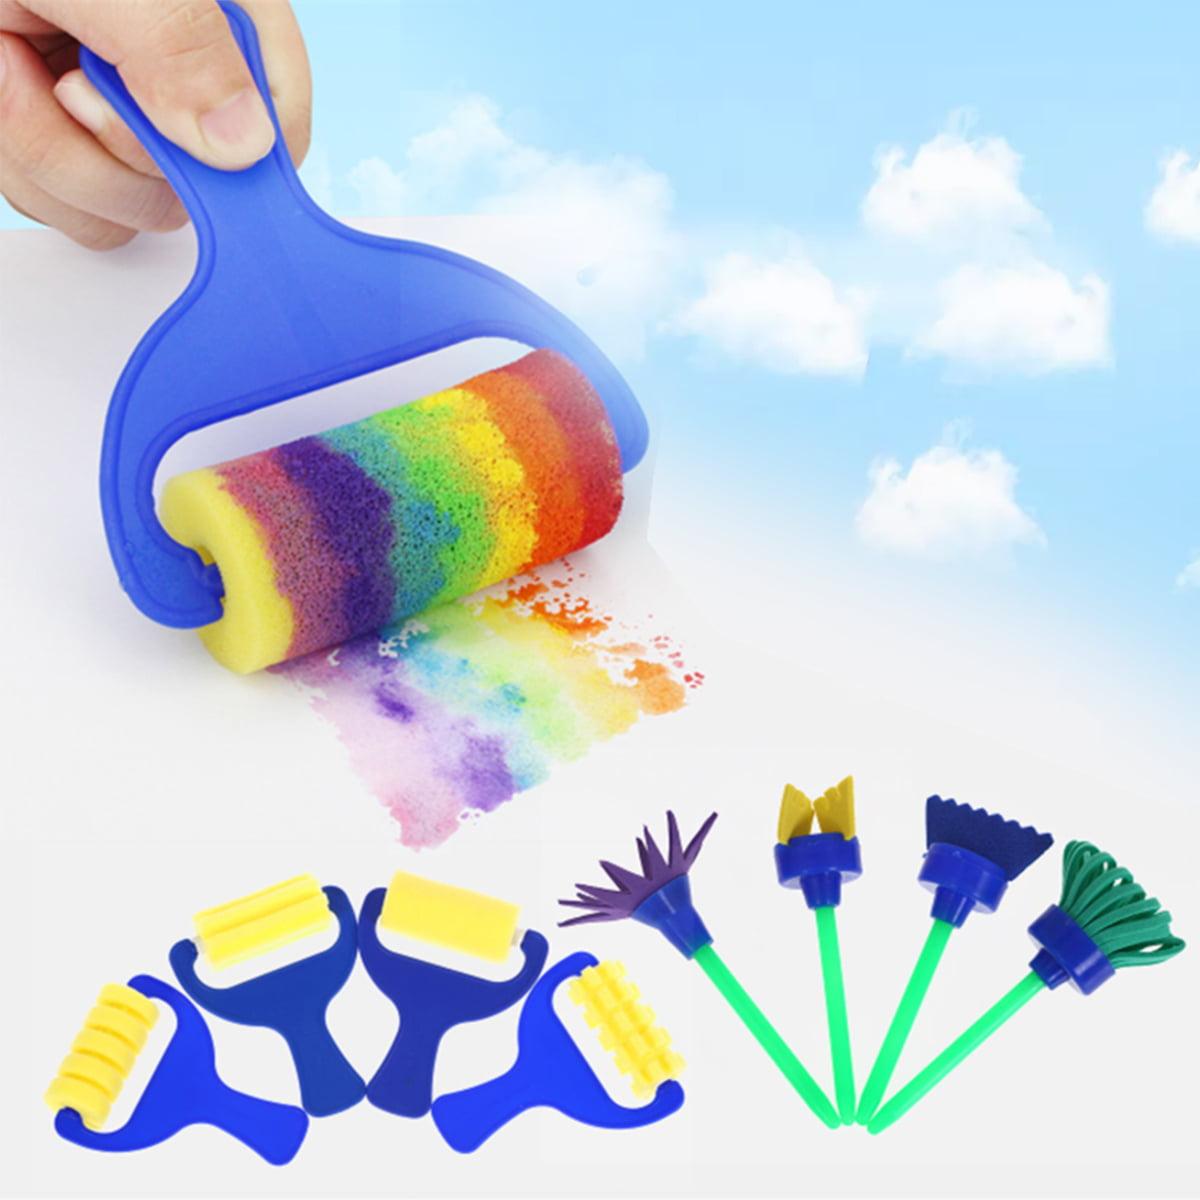 New Kids Painting Tools DIY Graffiti Painting Brush Watercolor Pen Drawing Toys